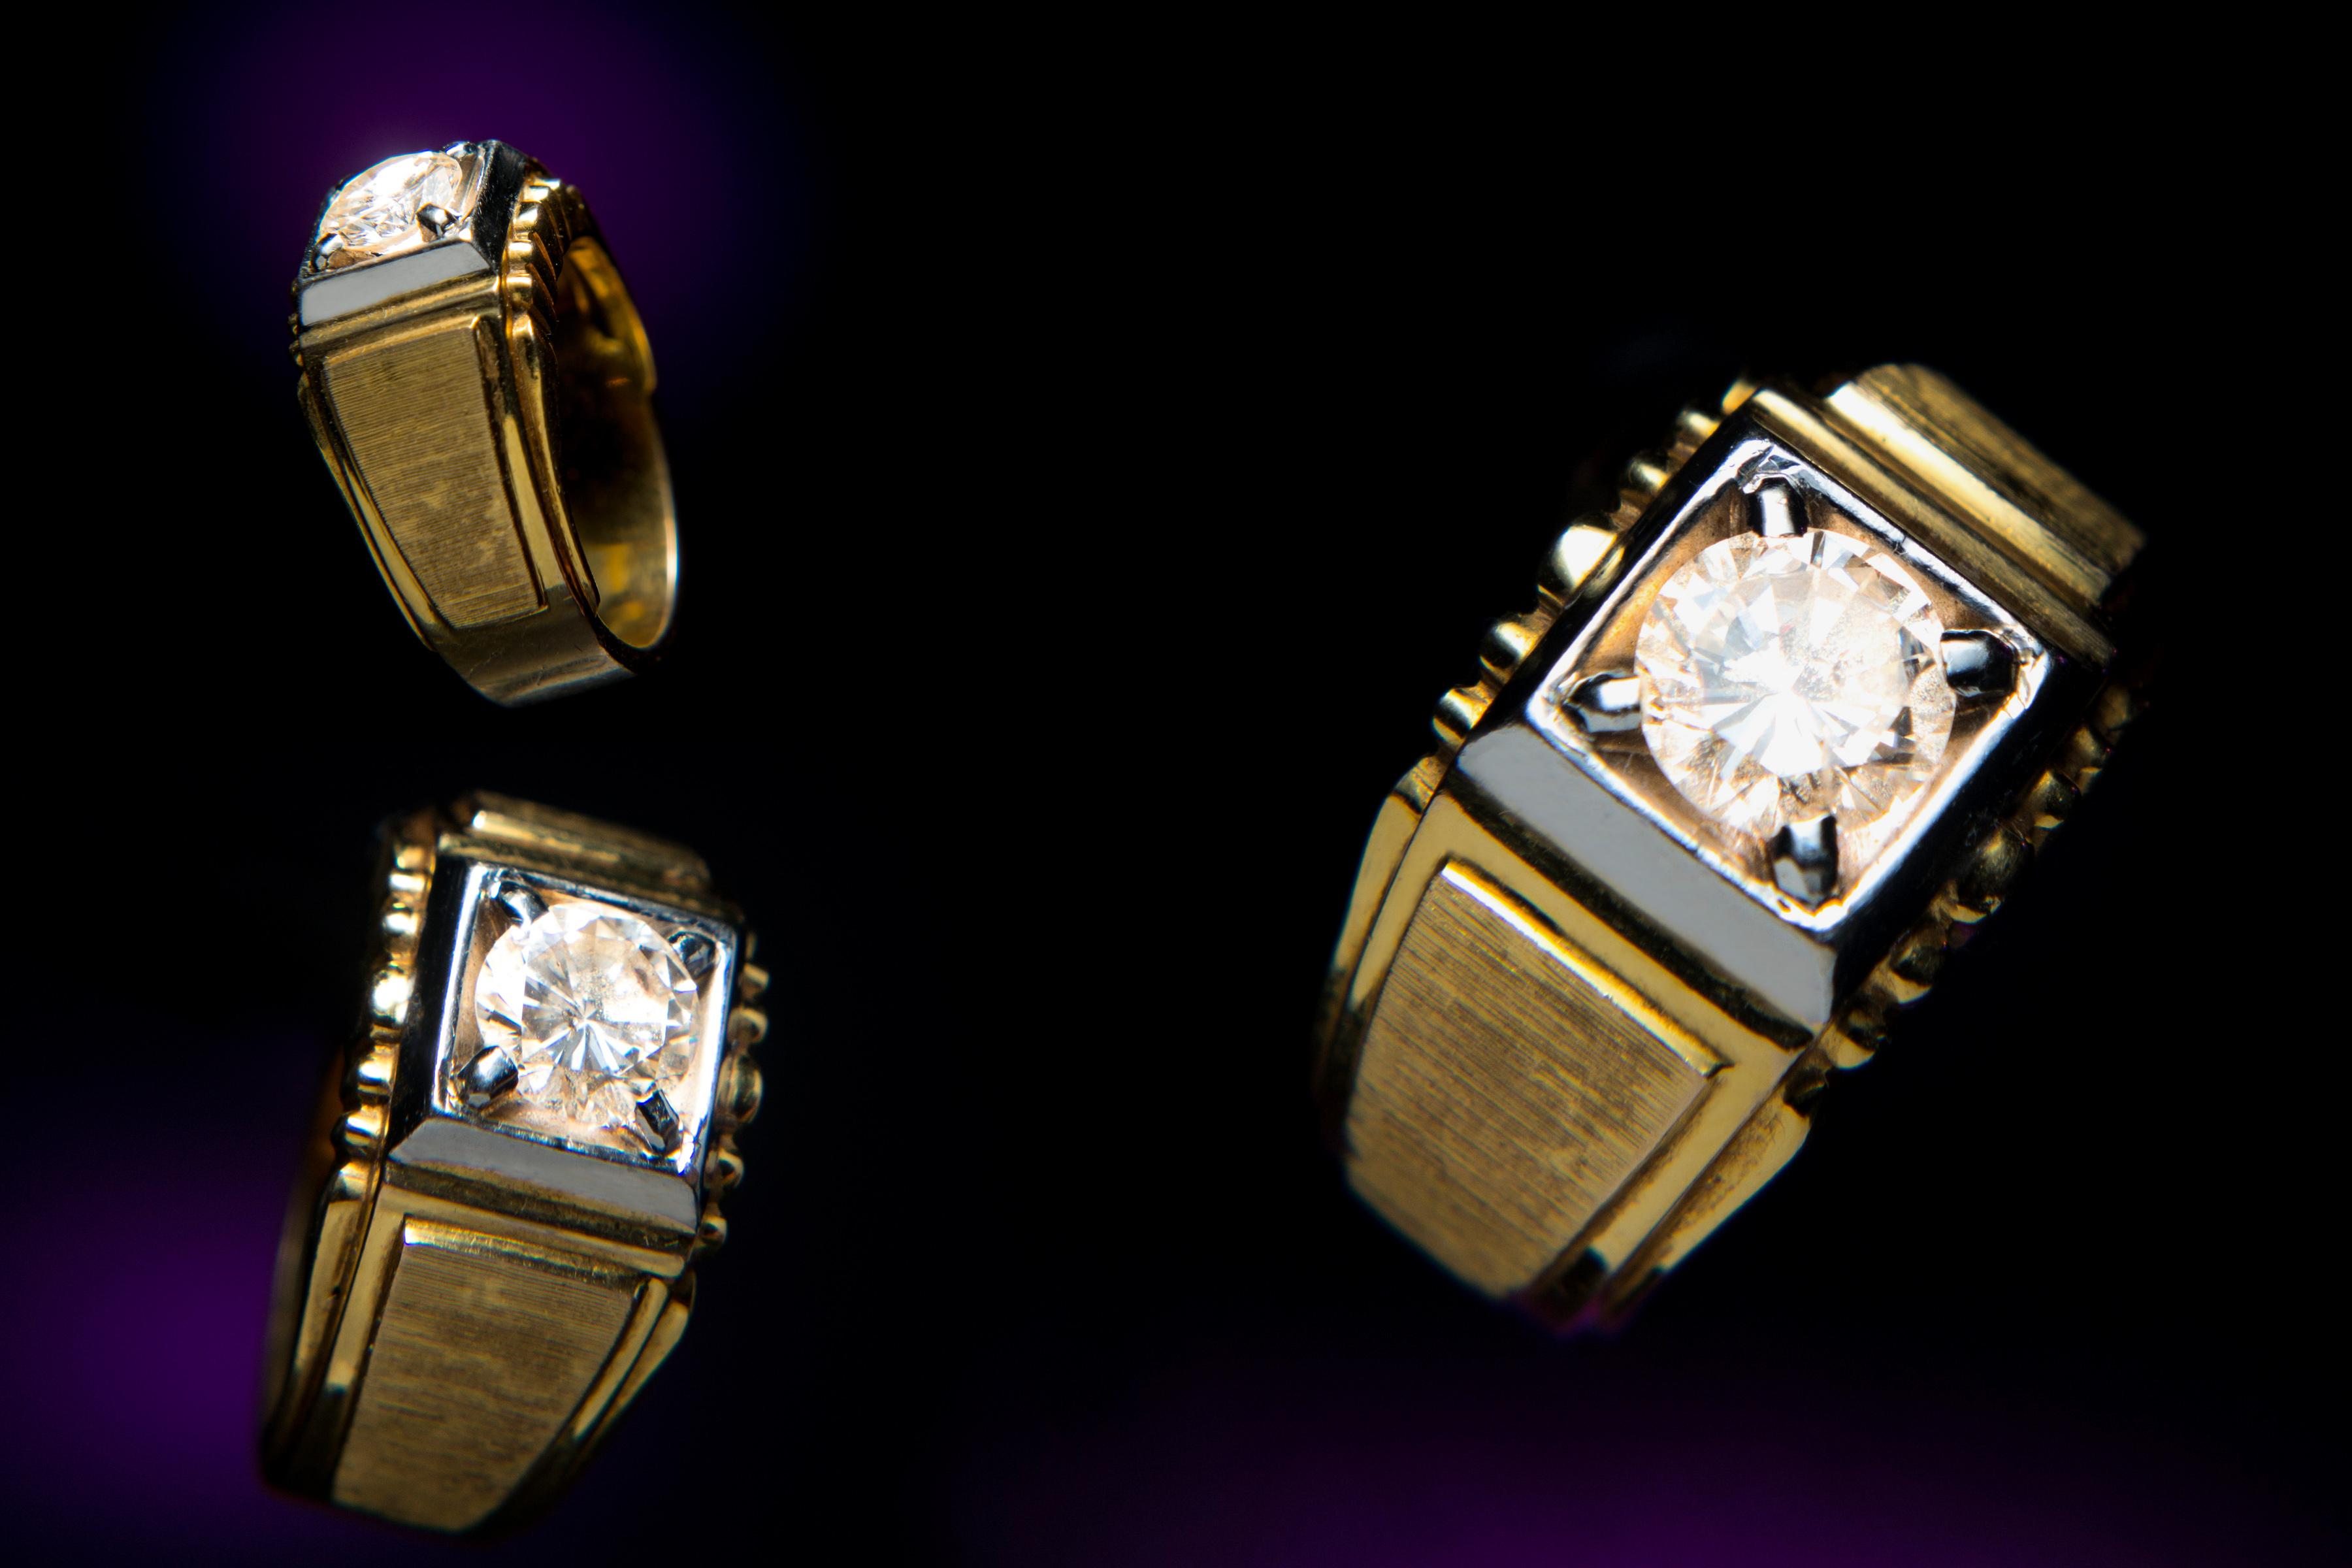 diamond-gold-ring-product-photography-parramatta